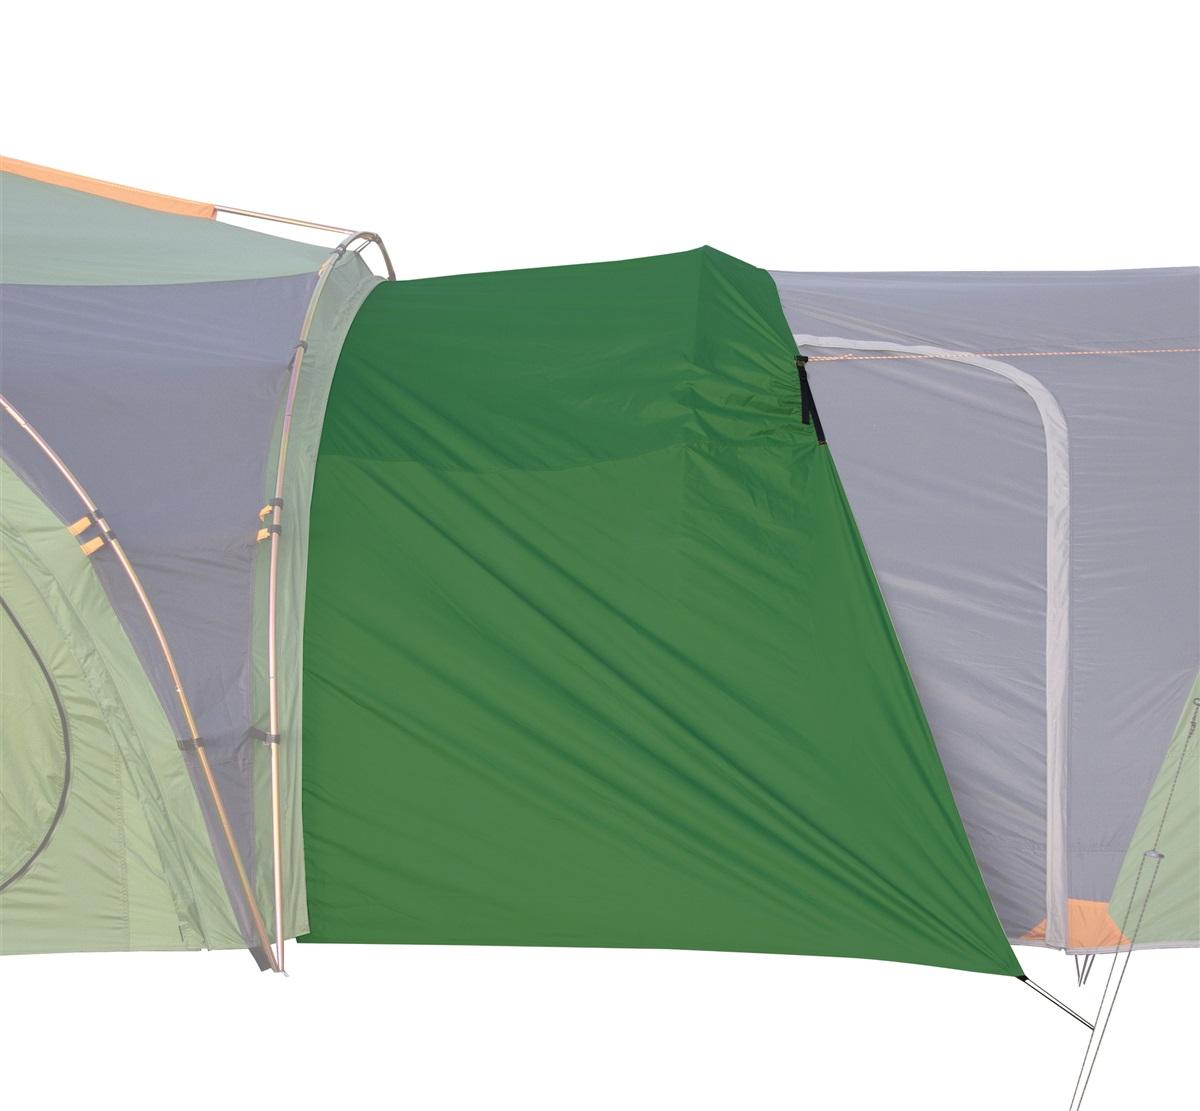 Savanna 3 5 Deluxe Tunnel Kiwi Camping Nz